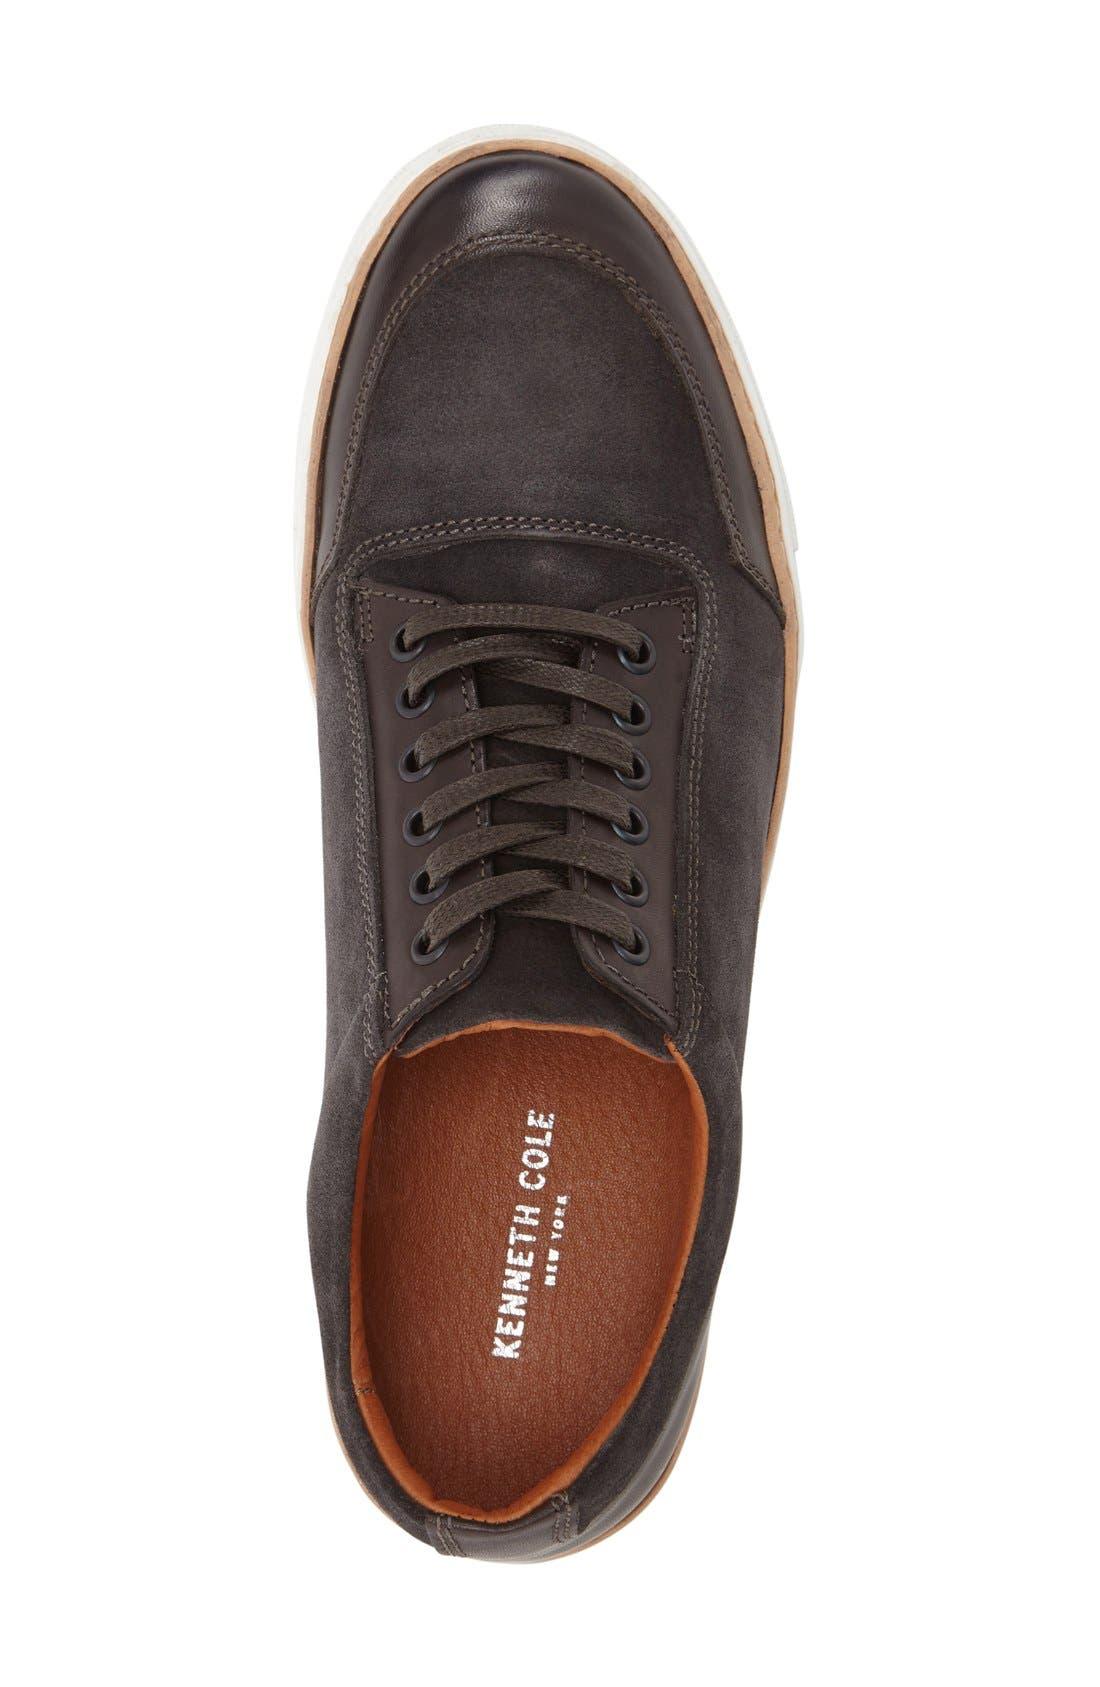 Prem-Ium Sneaker,                             Alternate thumbnail 3, color,                             020